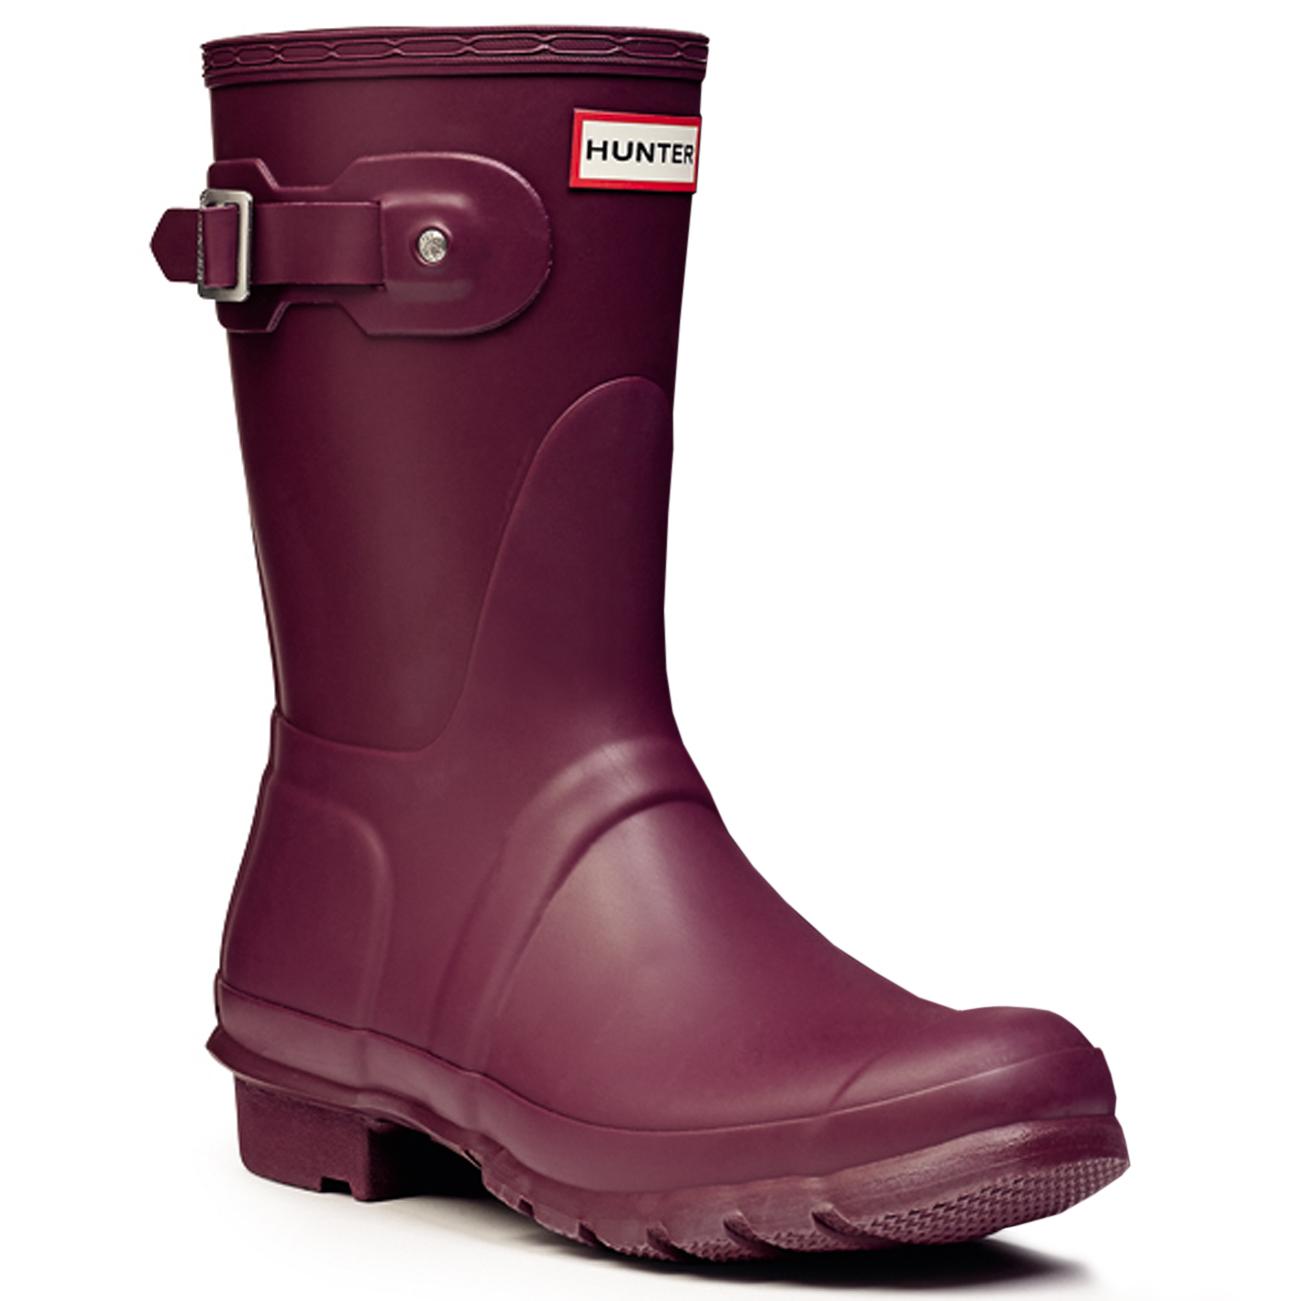 Perfect Womens Hunter Original Tour Rain Winter Snow Festival Wellington Boots US 5-11